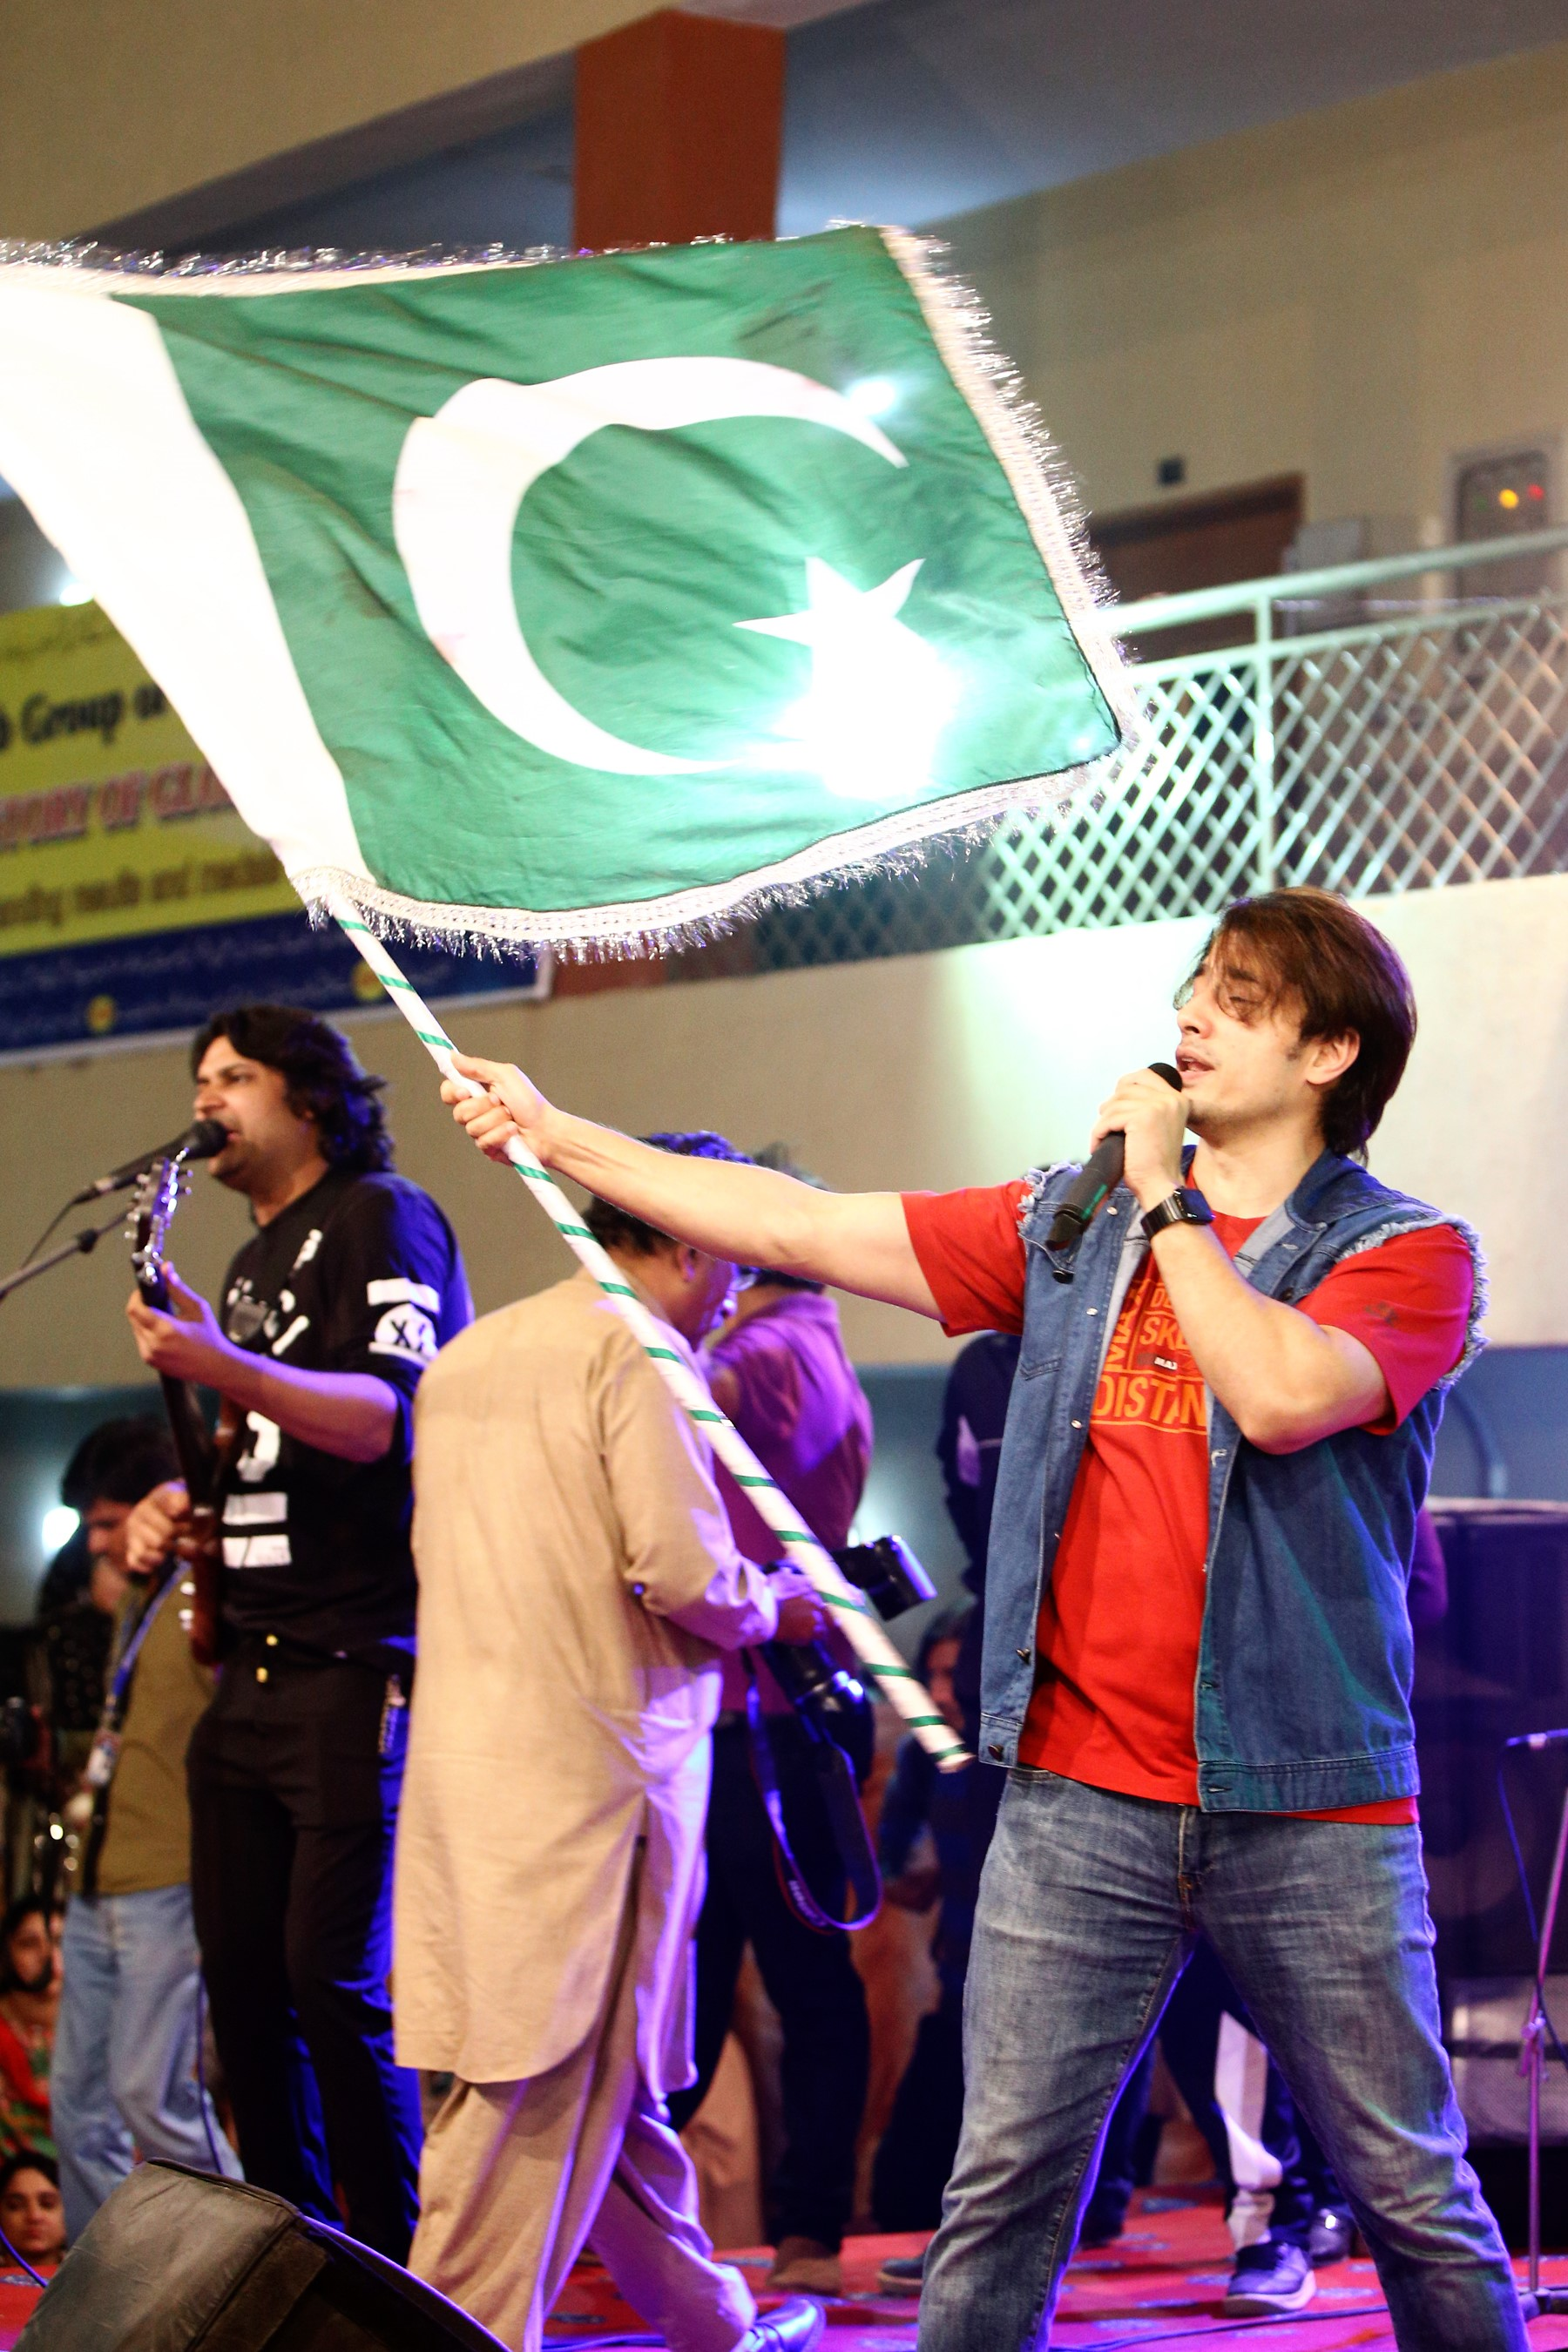 Bmw X2 Price In Pakistan >> Ali zafar concert punjab - Brandsynario